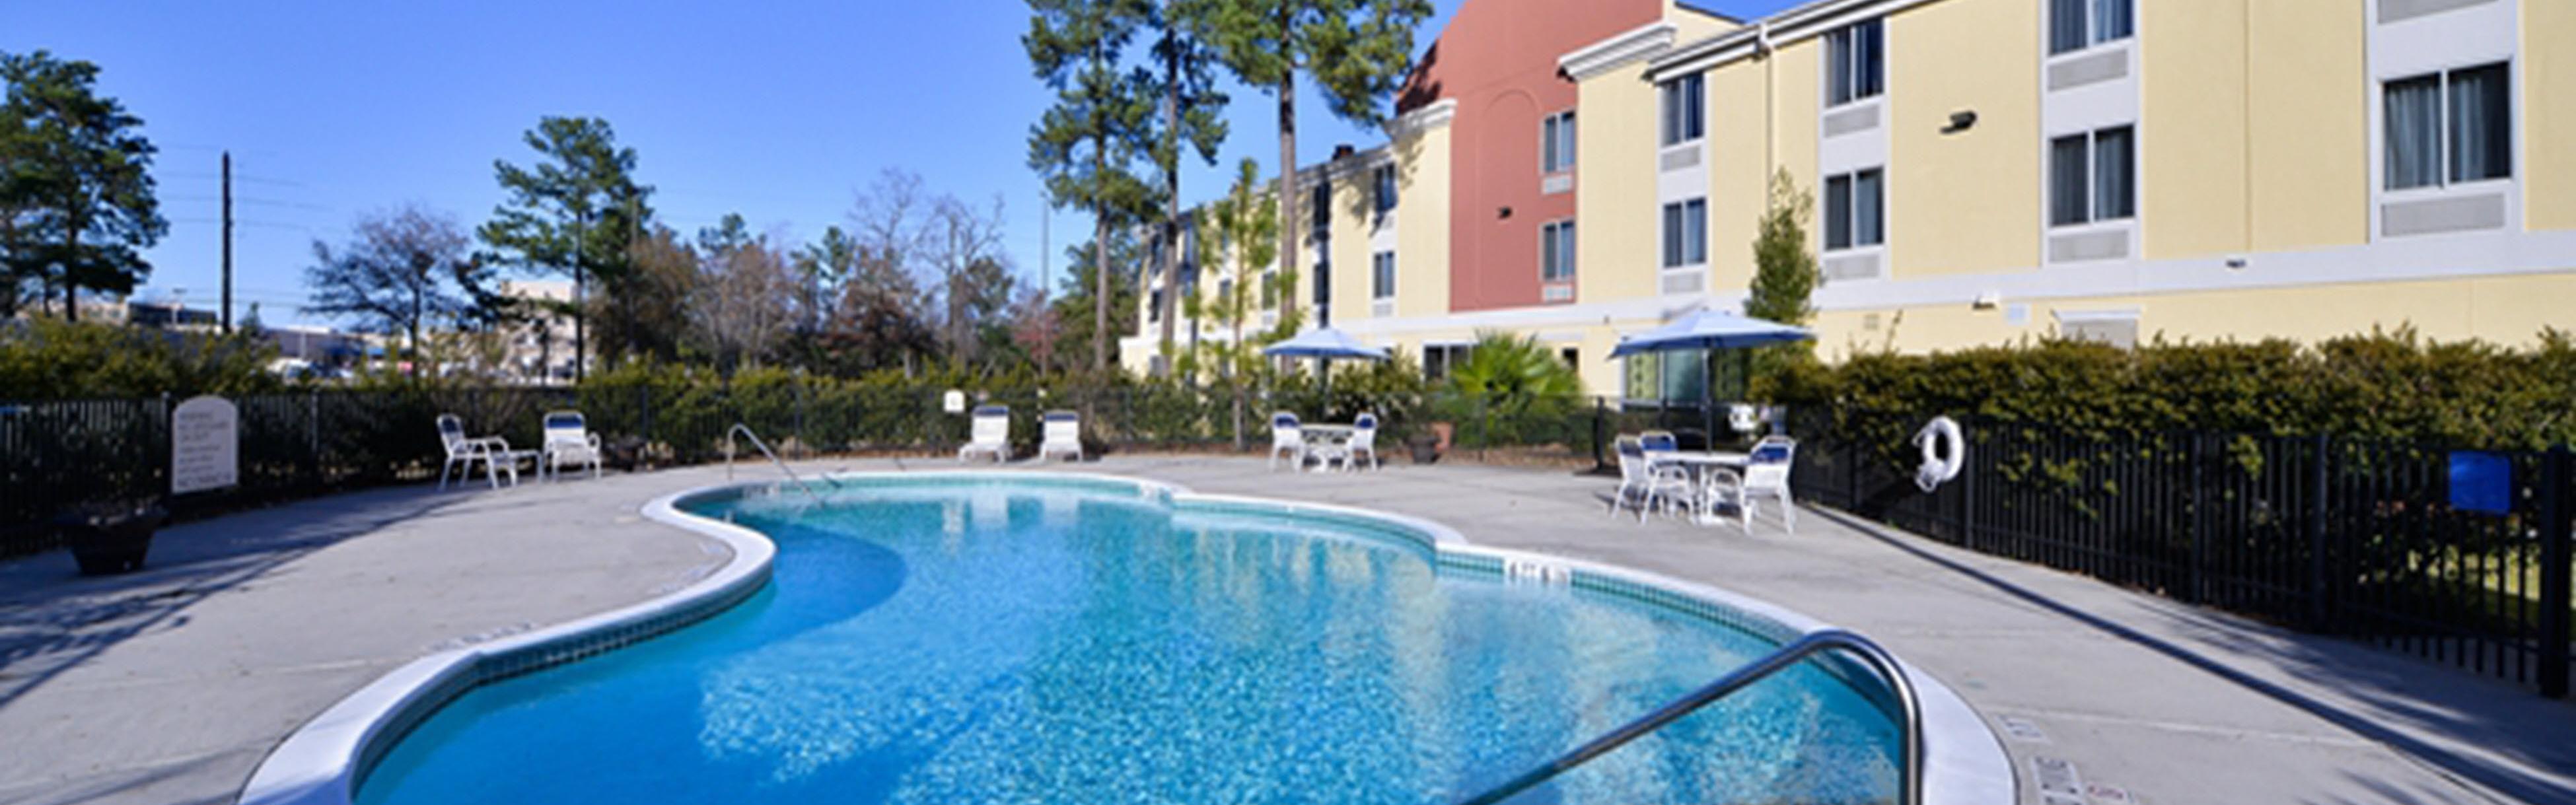 Holiday Inn Express & Suites Kingwood - Medical Center Area image 2